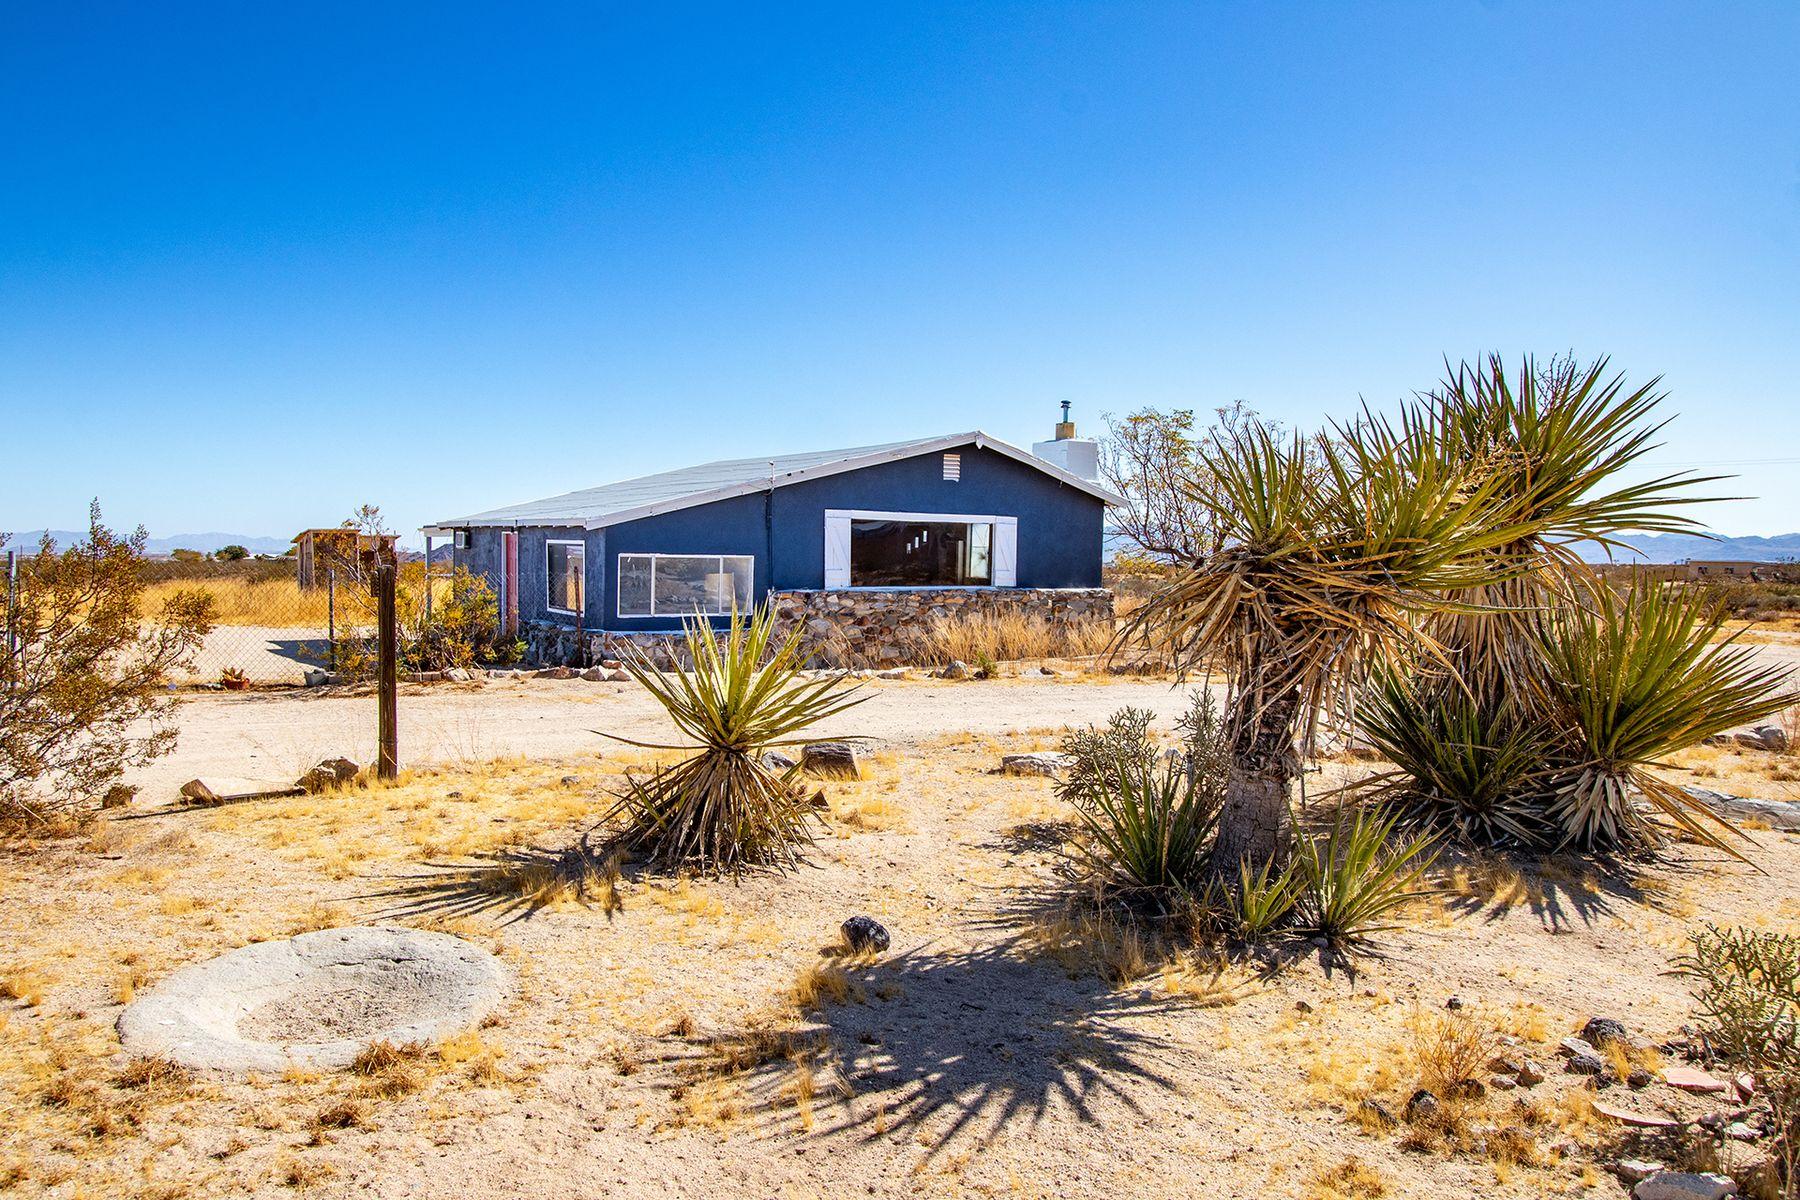 Single Family Homes for Sale at 1523 Shangrila Lane Joshua Tree, California 92252 United States